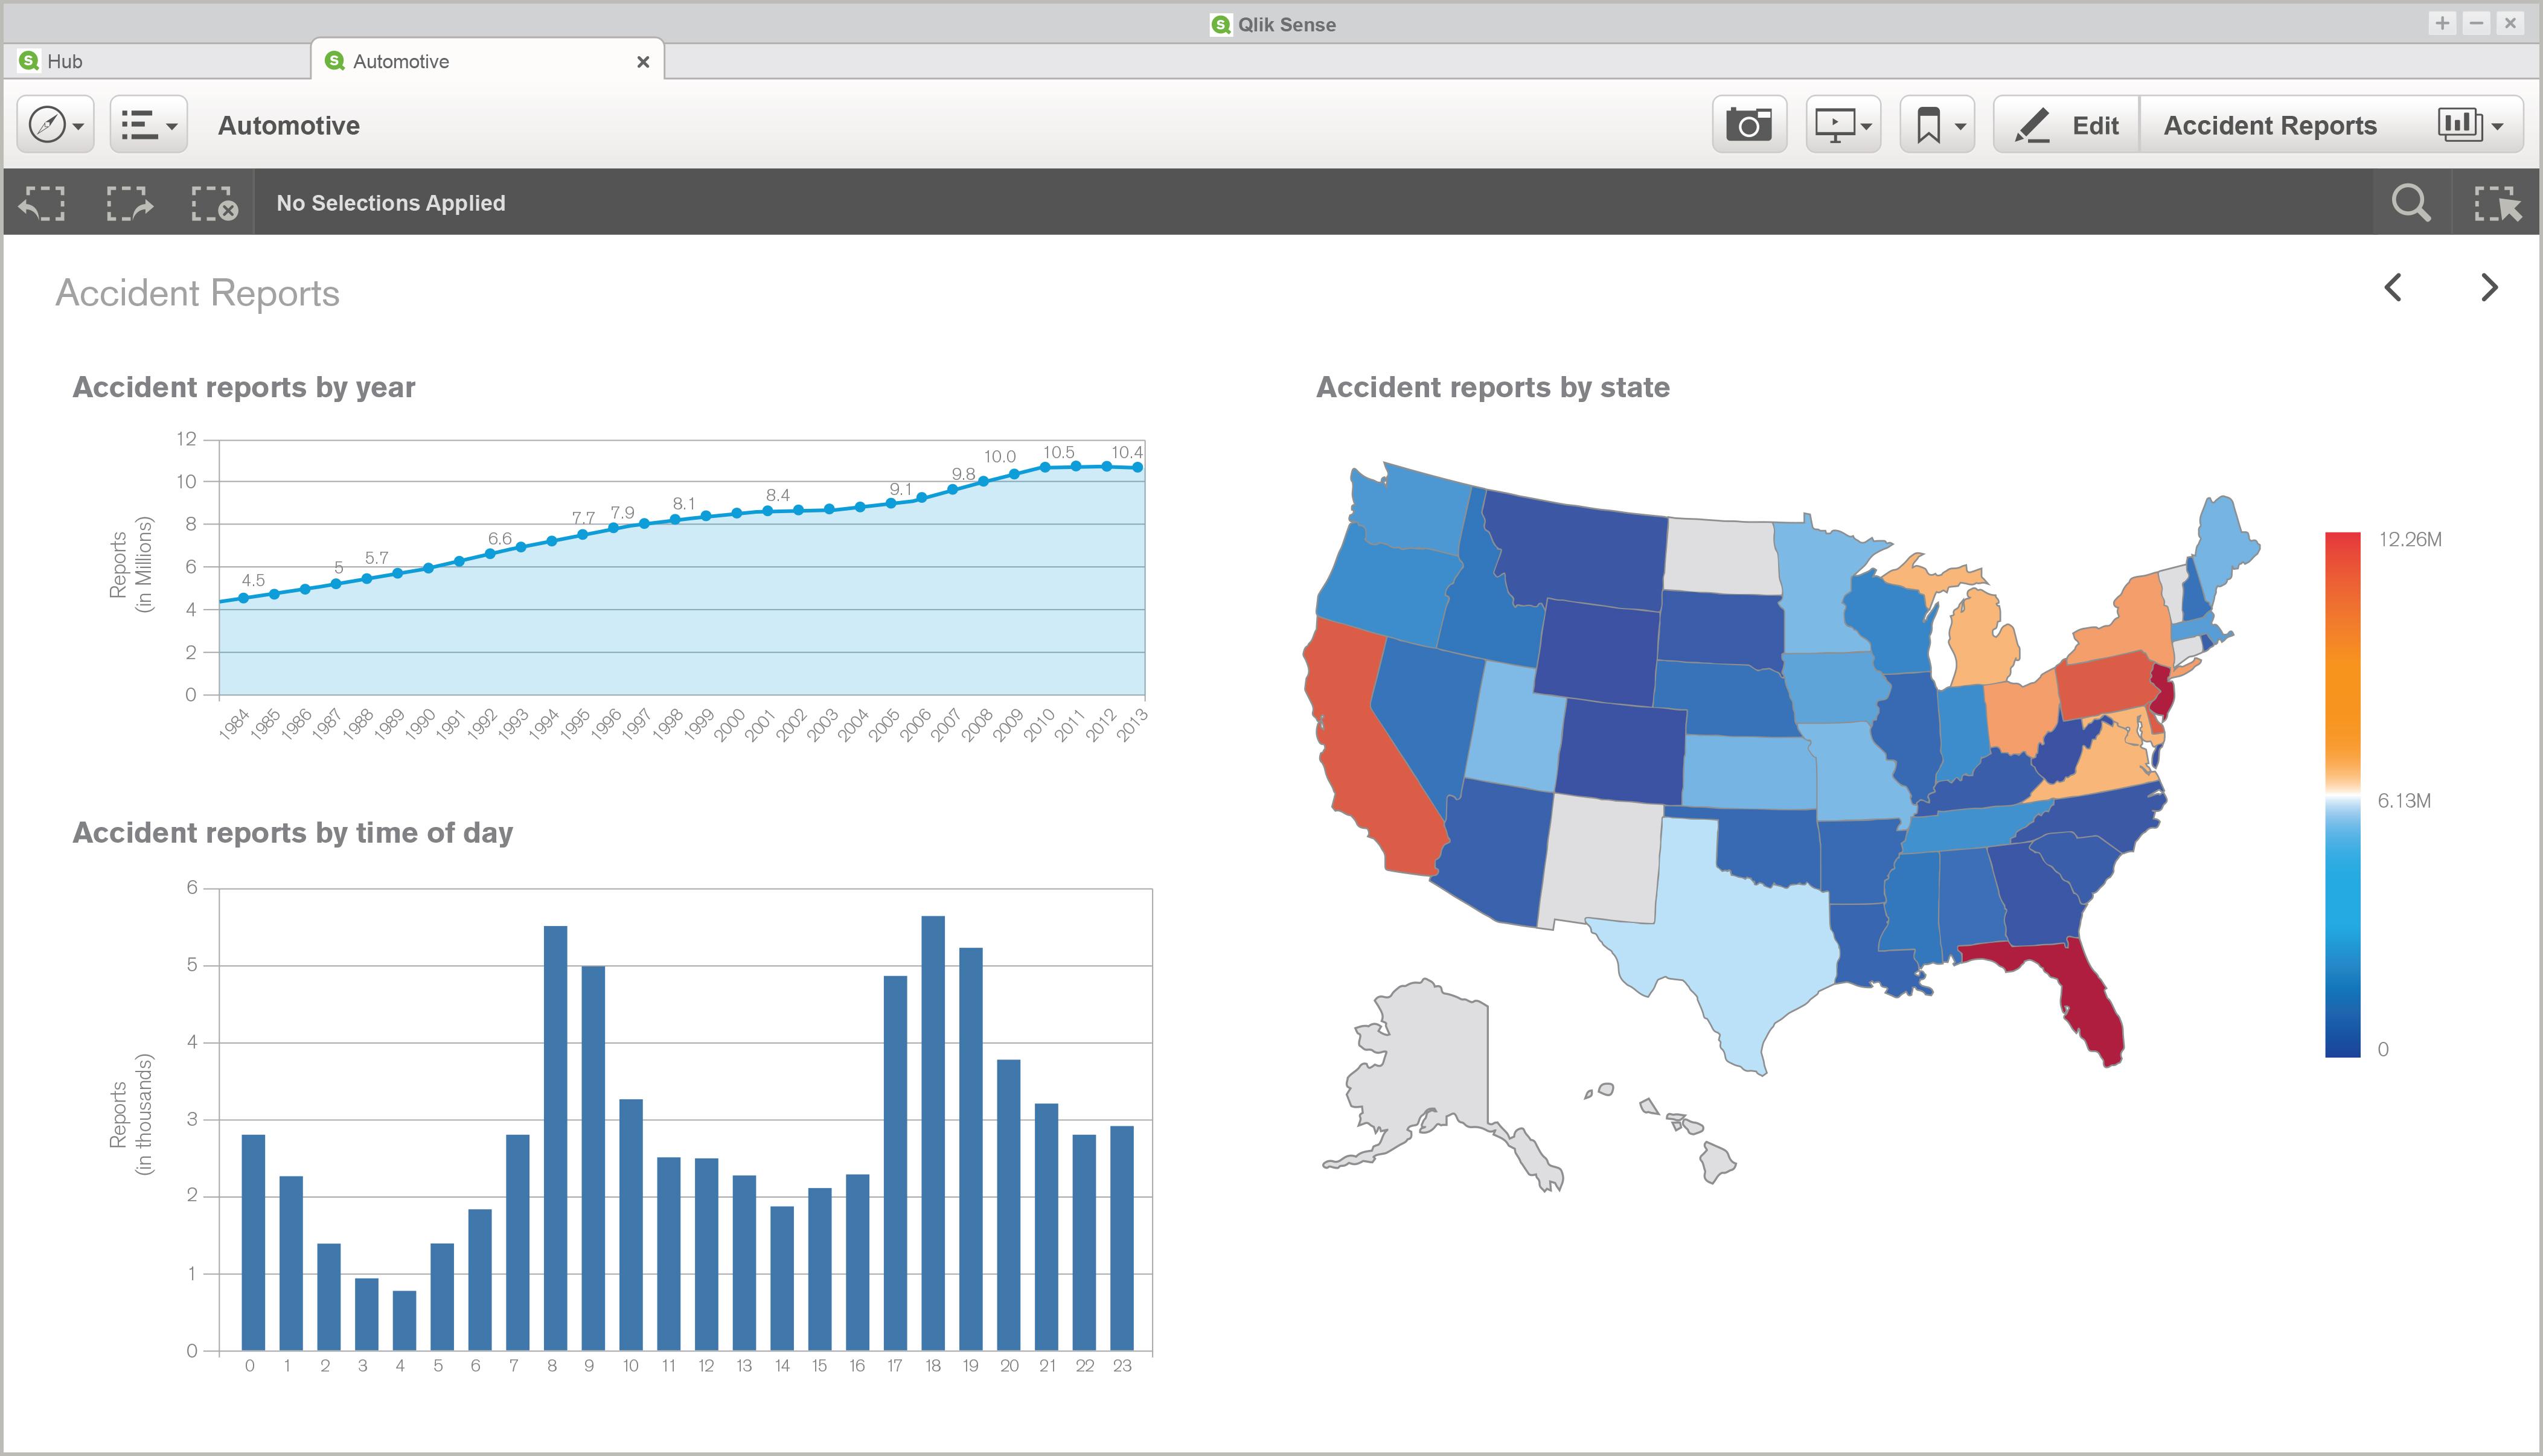 Qlik Sense - Mapping and graphing capabilities